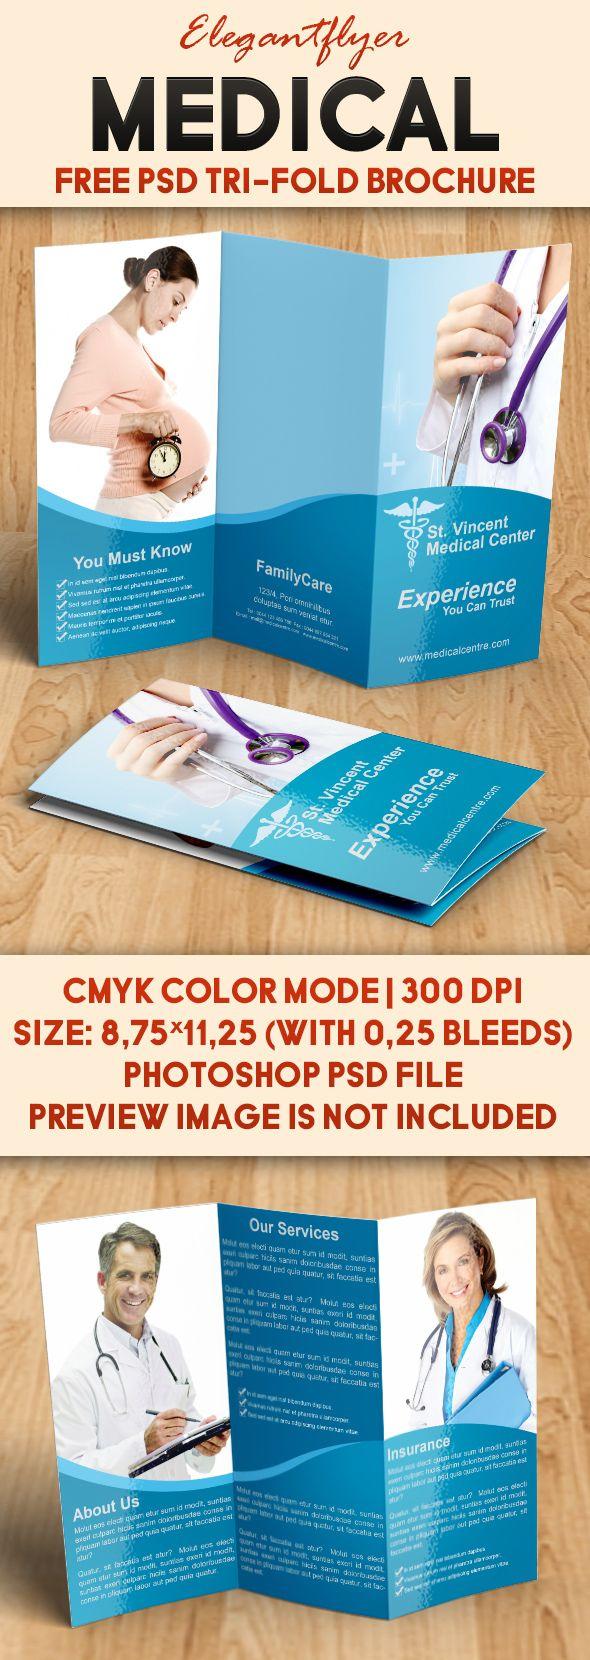 Medical  Free Brochure Psd Template HttpsWwwElegantflyerCom